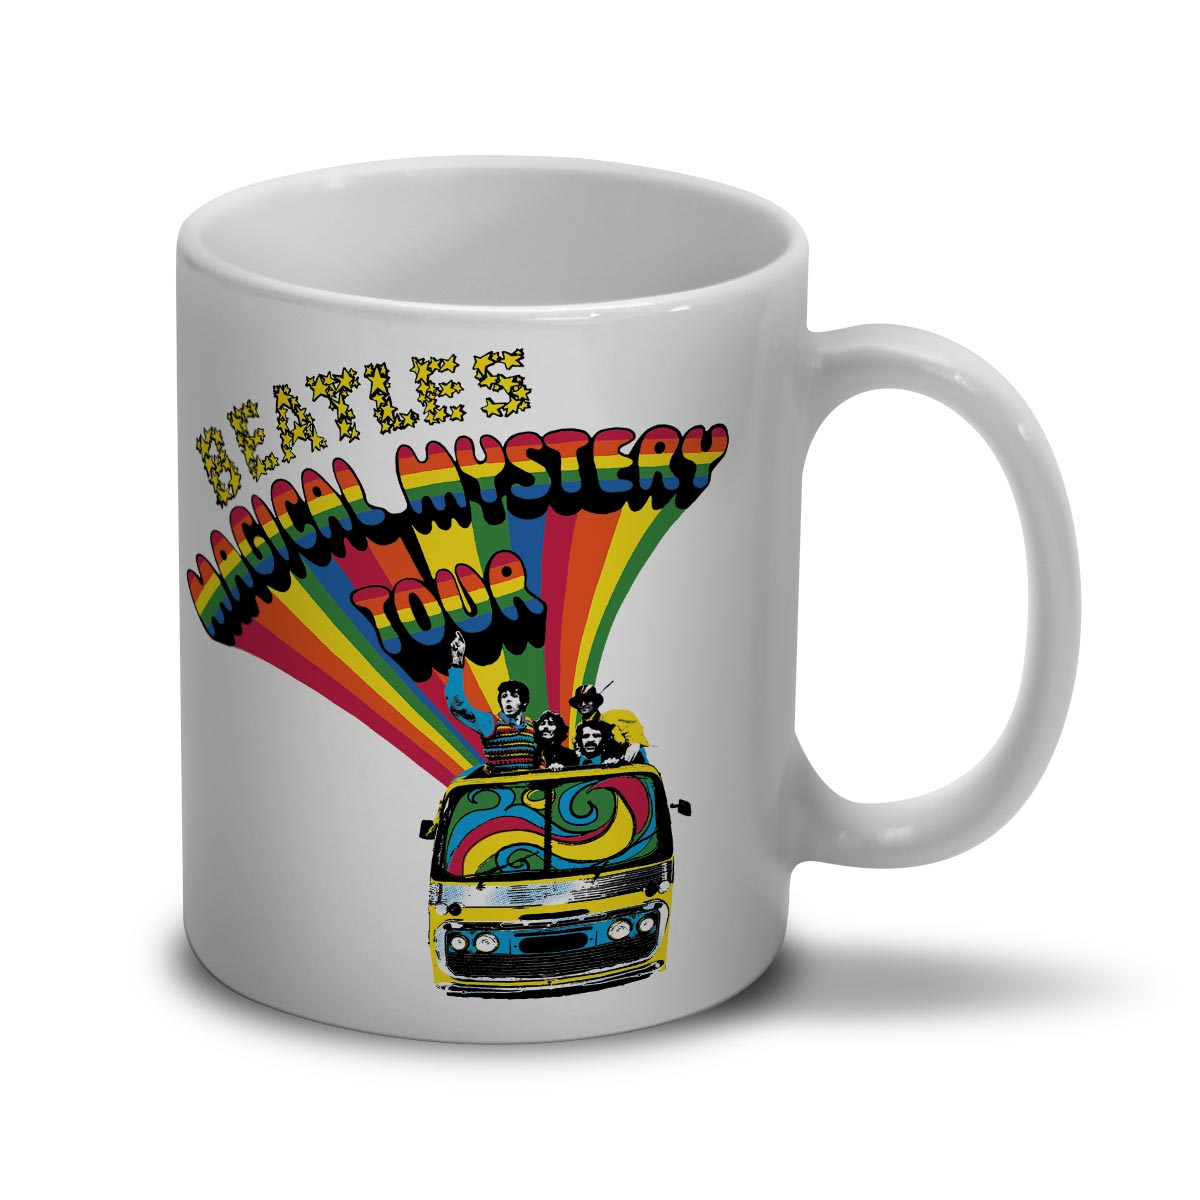 Caneca The Beatles Magical Mistery Tour